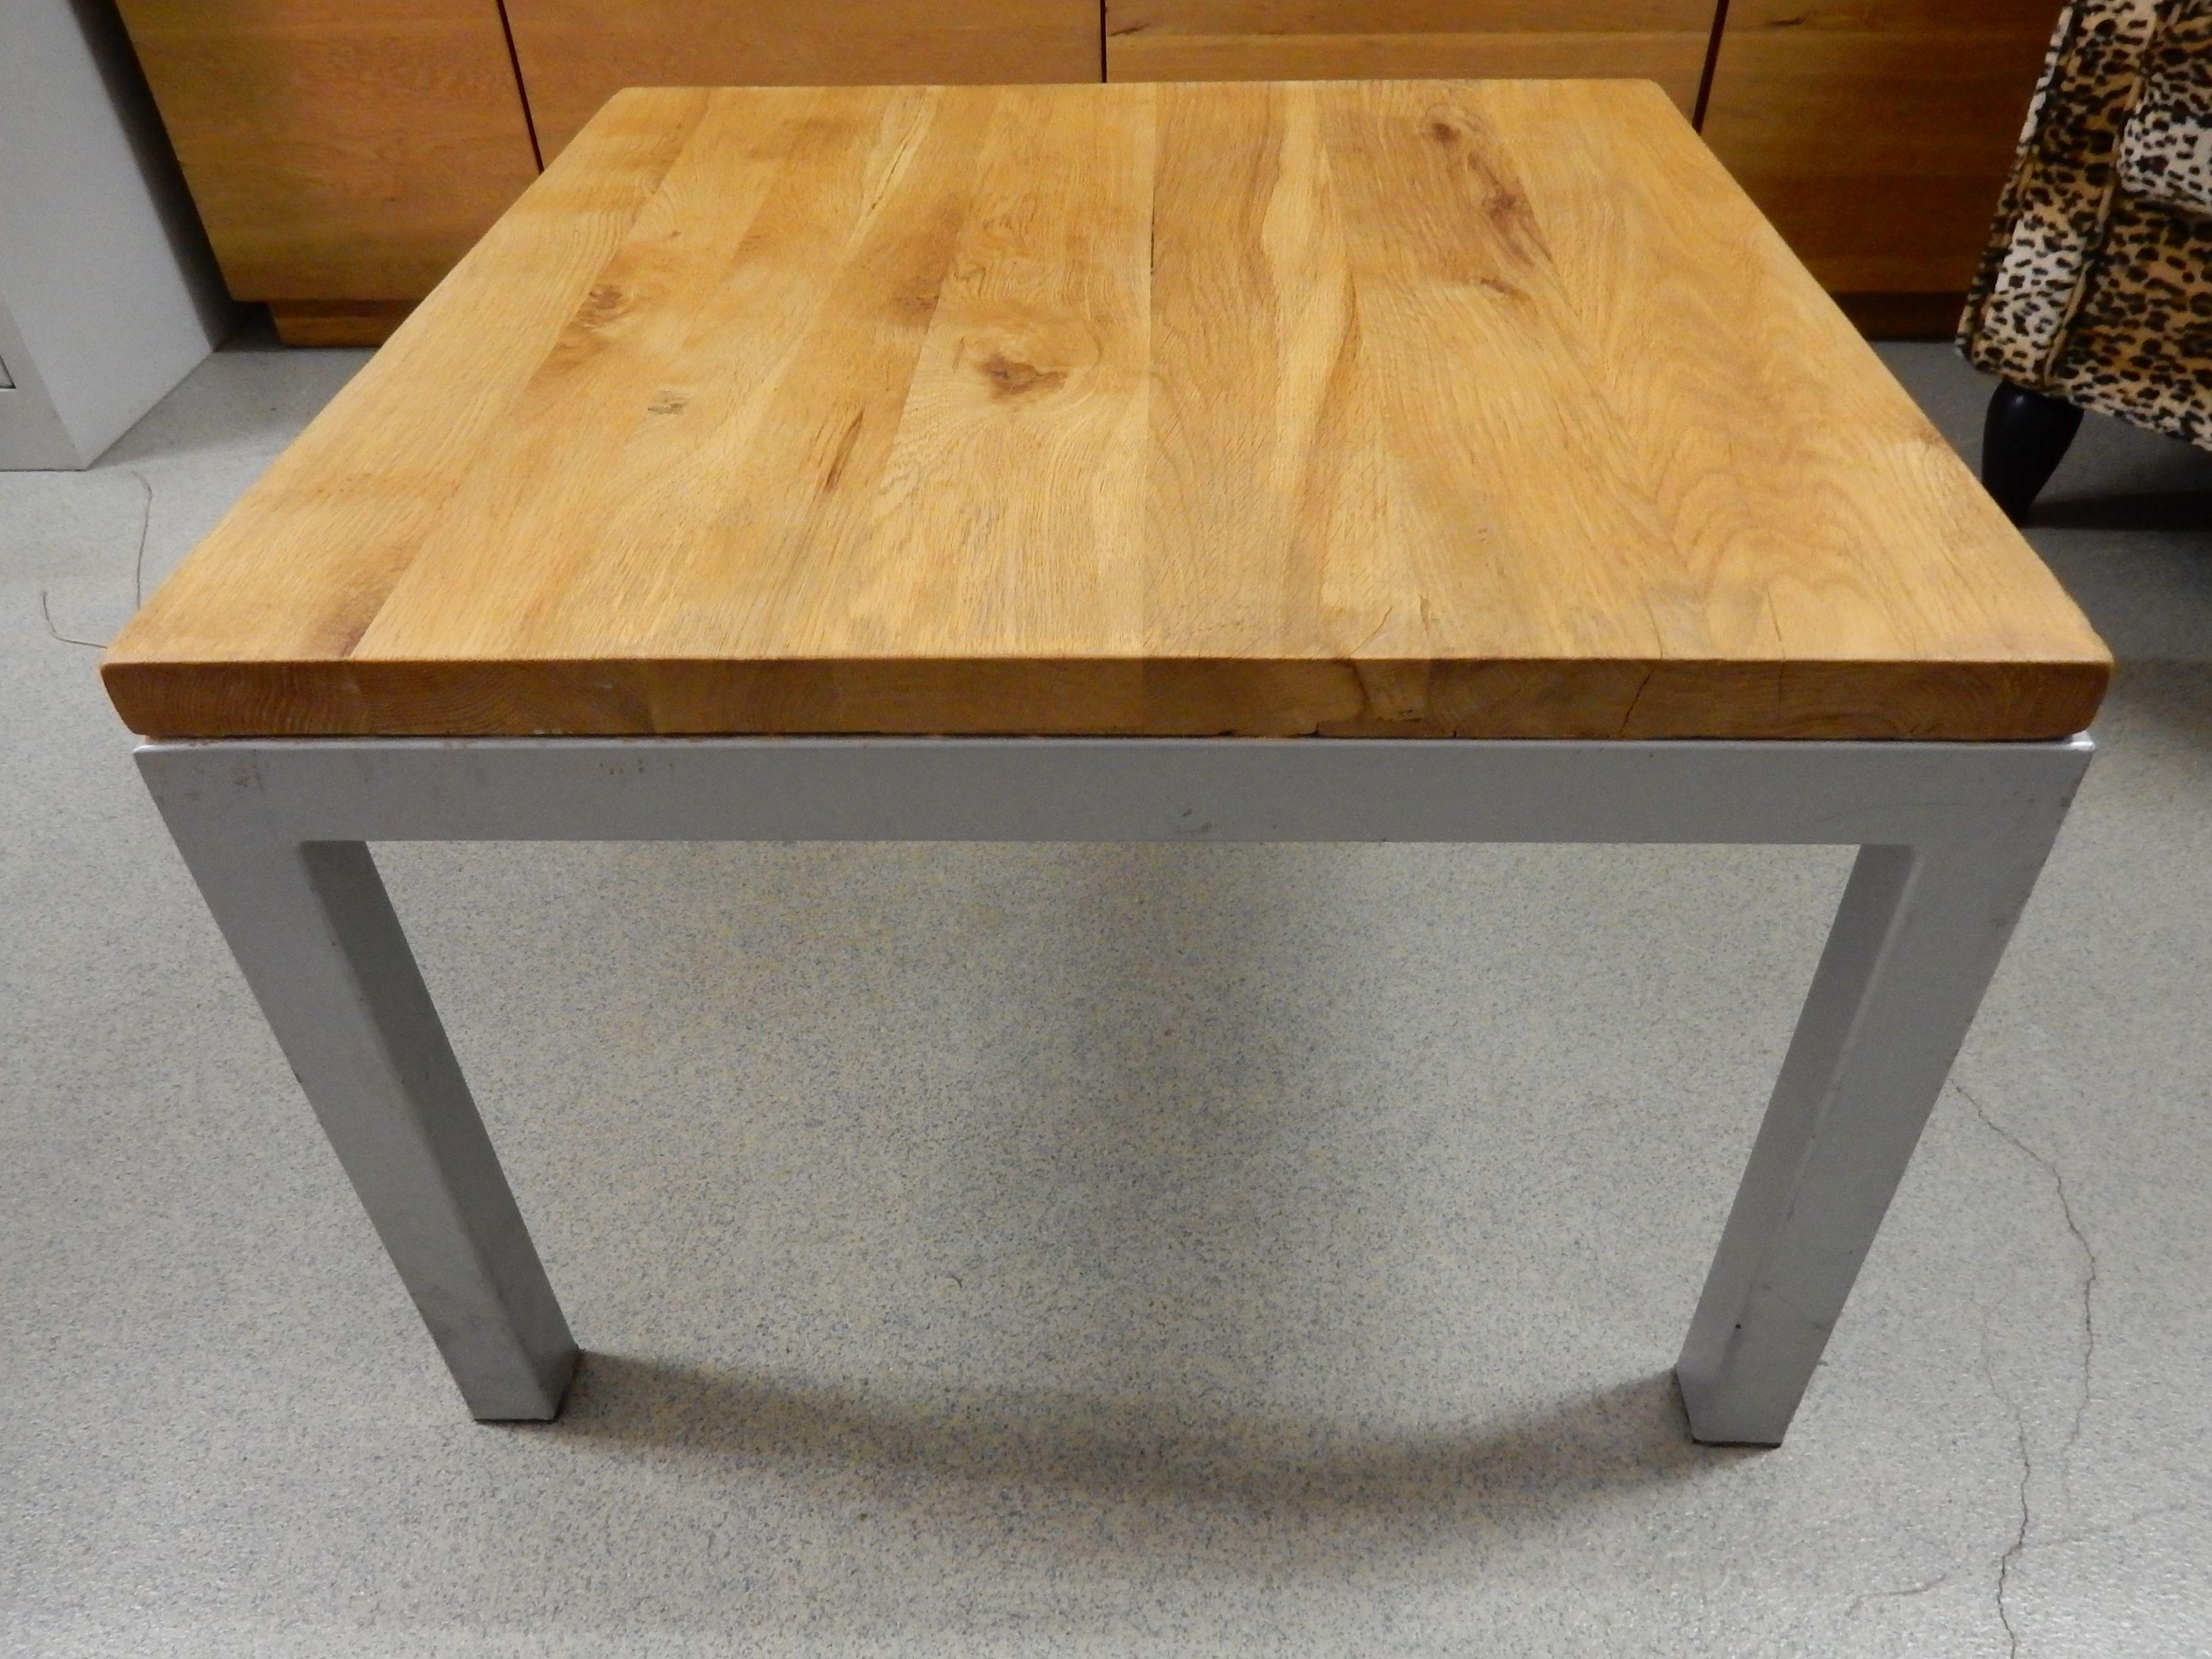 Licht Eiken Eettafel : Zelf tafel maken blank eiken modern ontwerp. cool with zelf tafel